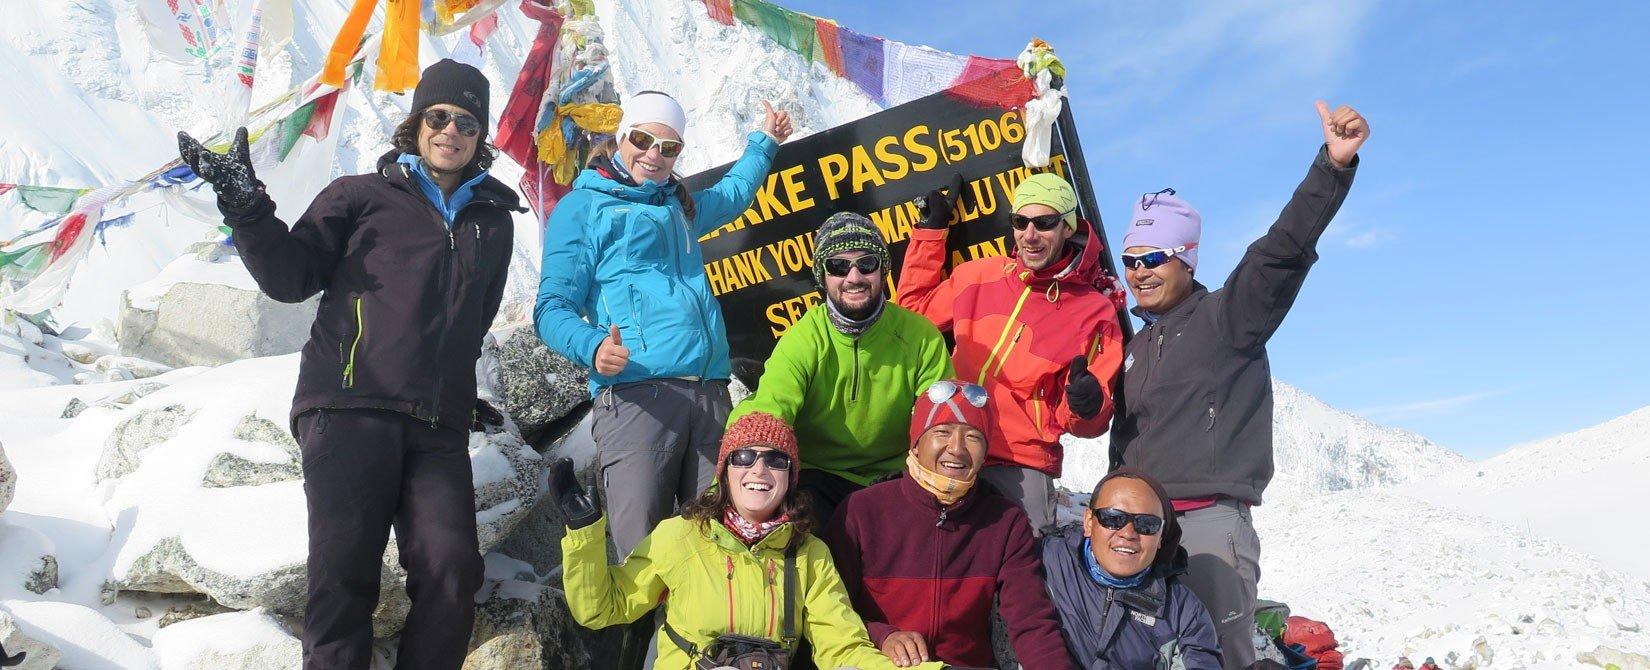 Larke la pass Trekking